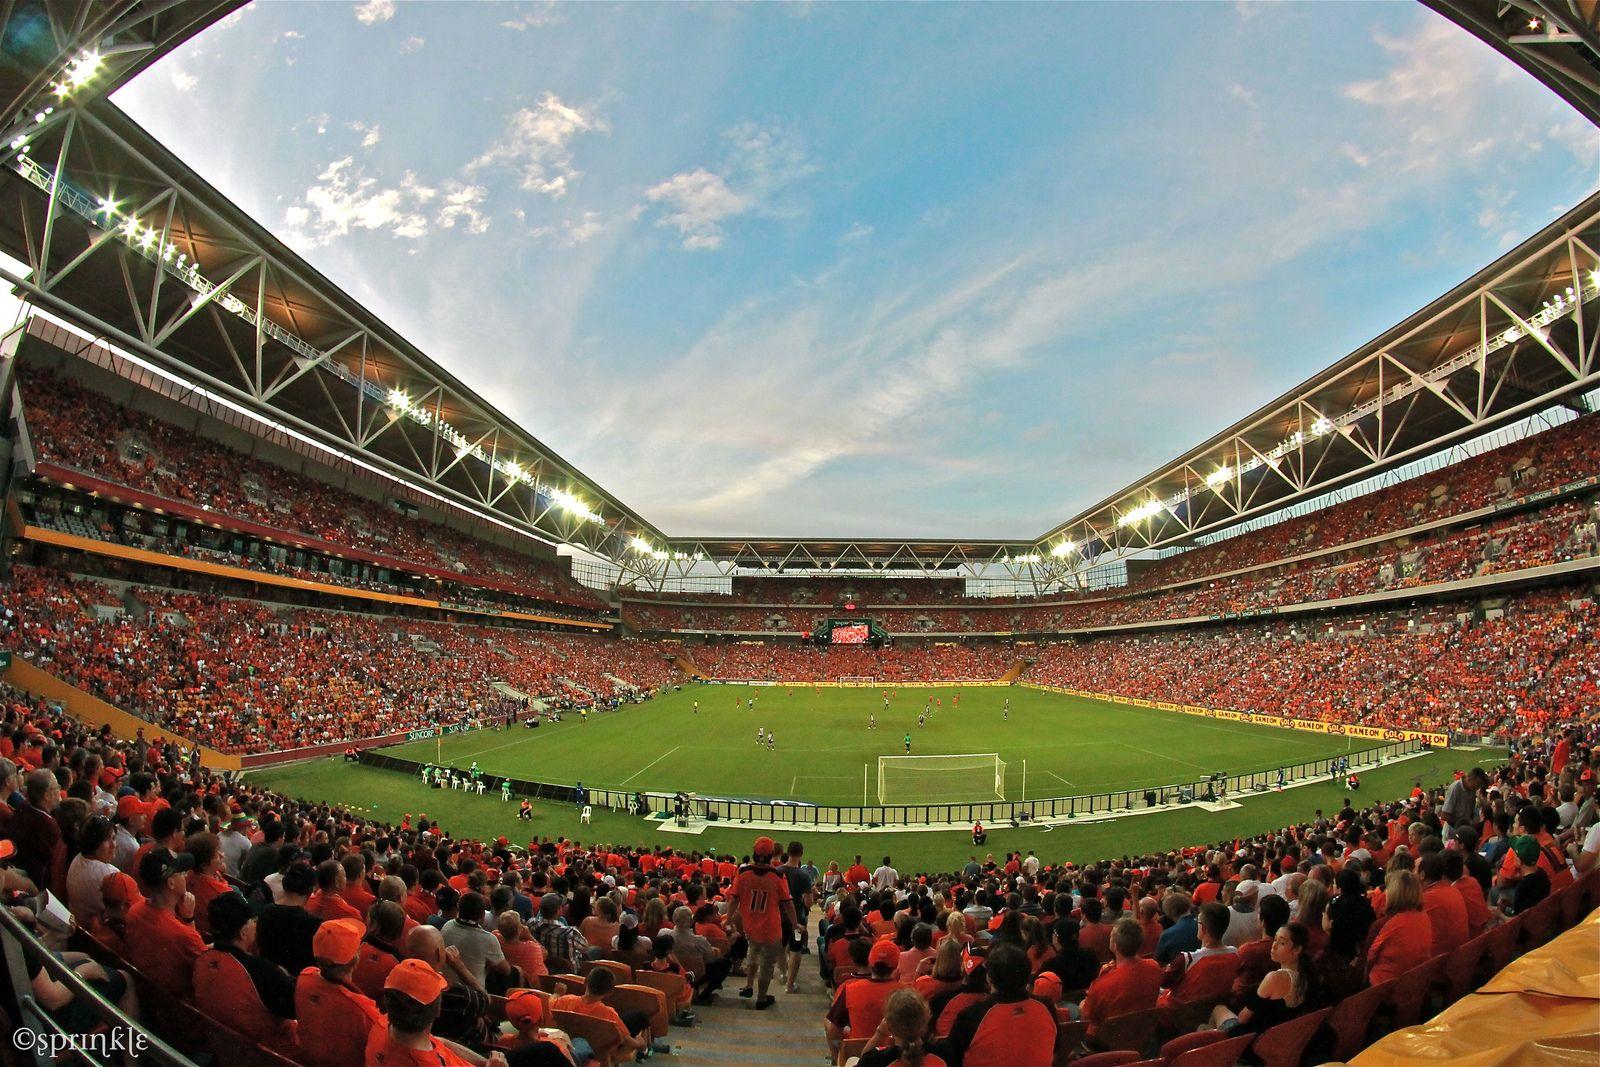 Brisbane Roar fc - Suncorp StadiumCapacity: 52500